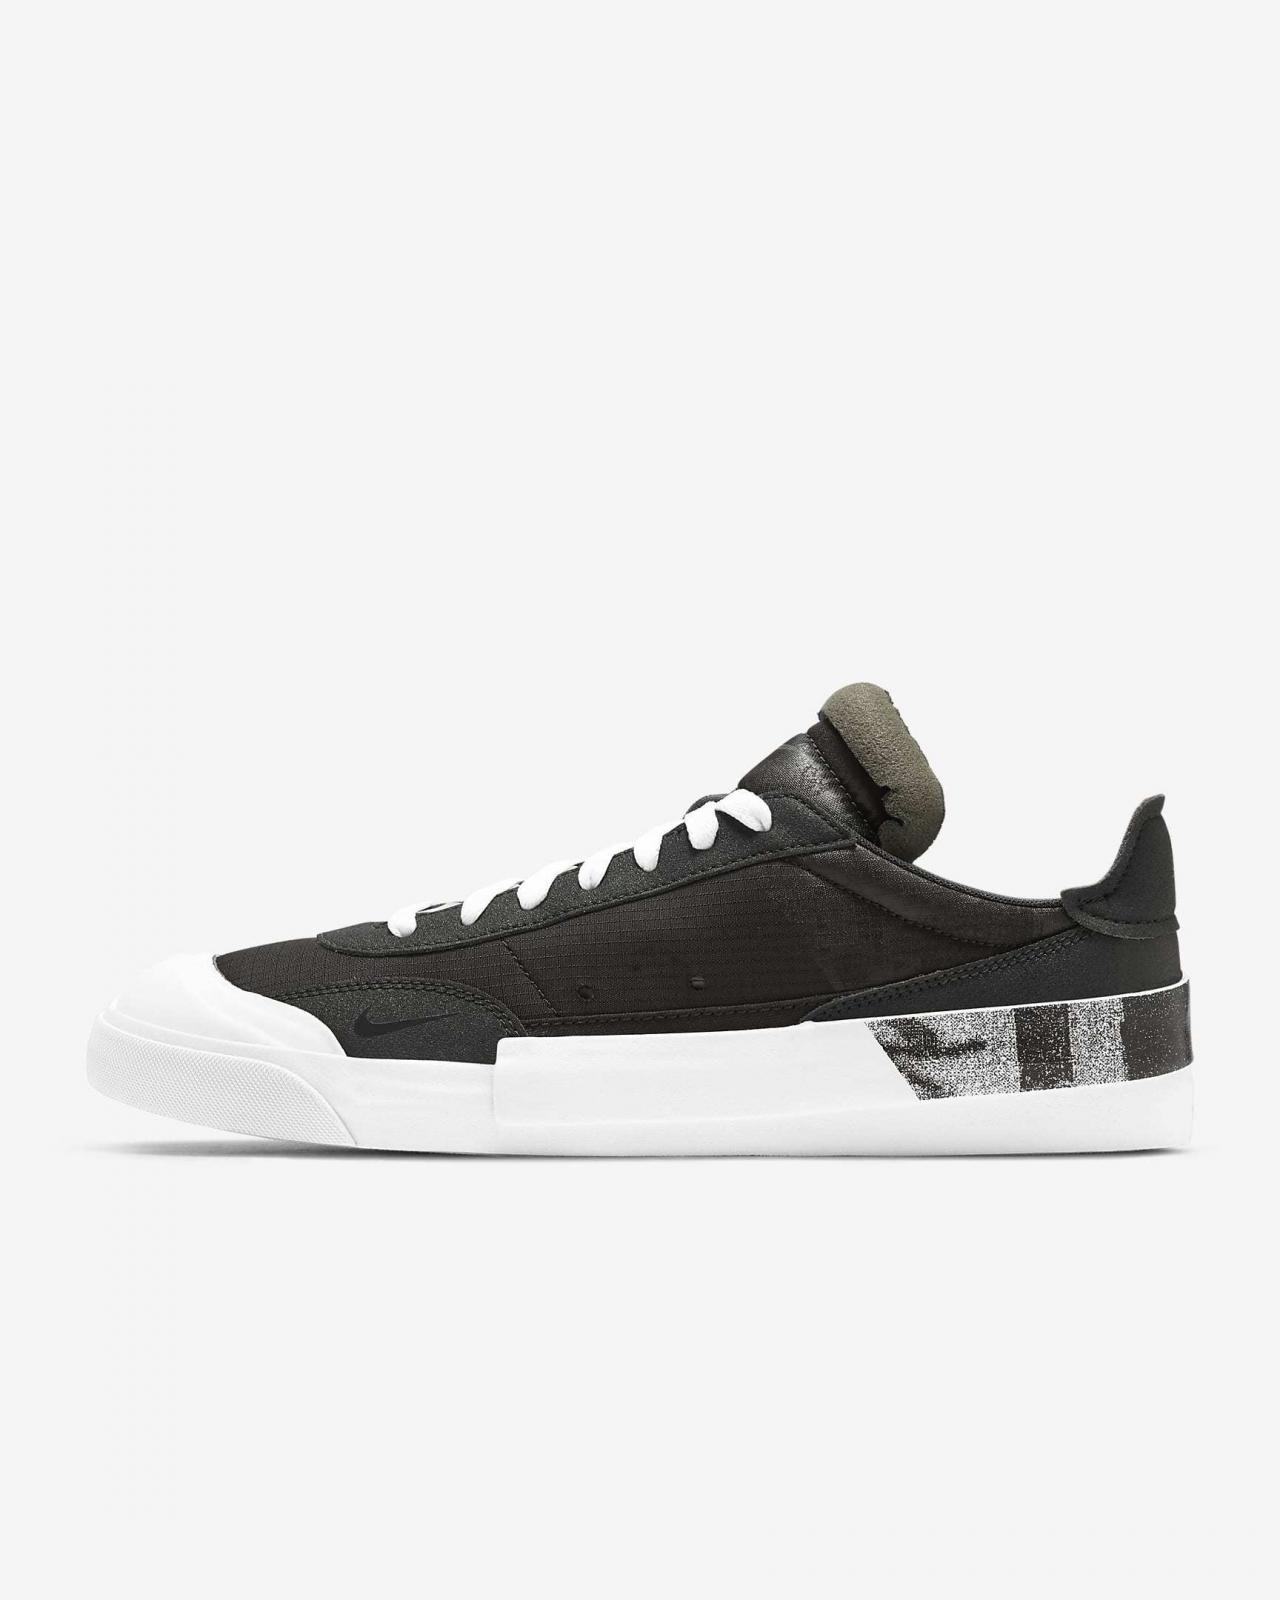 Nike Sportswear推出灰黑/白/黑色Drop-Type NRG